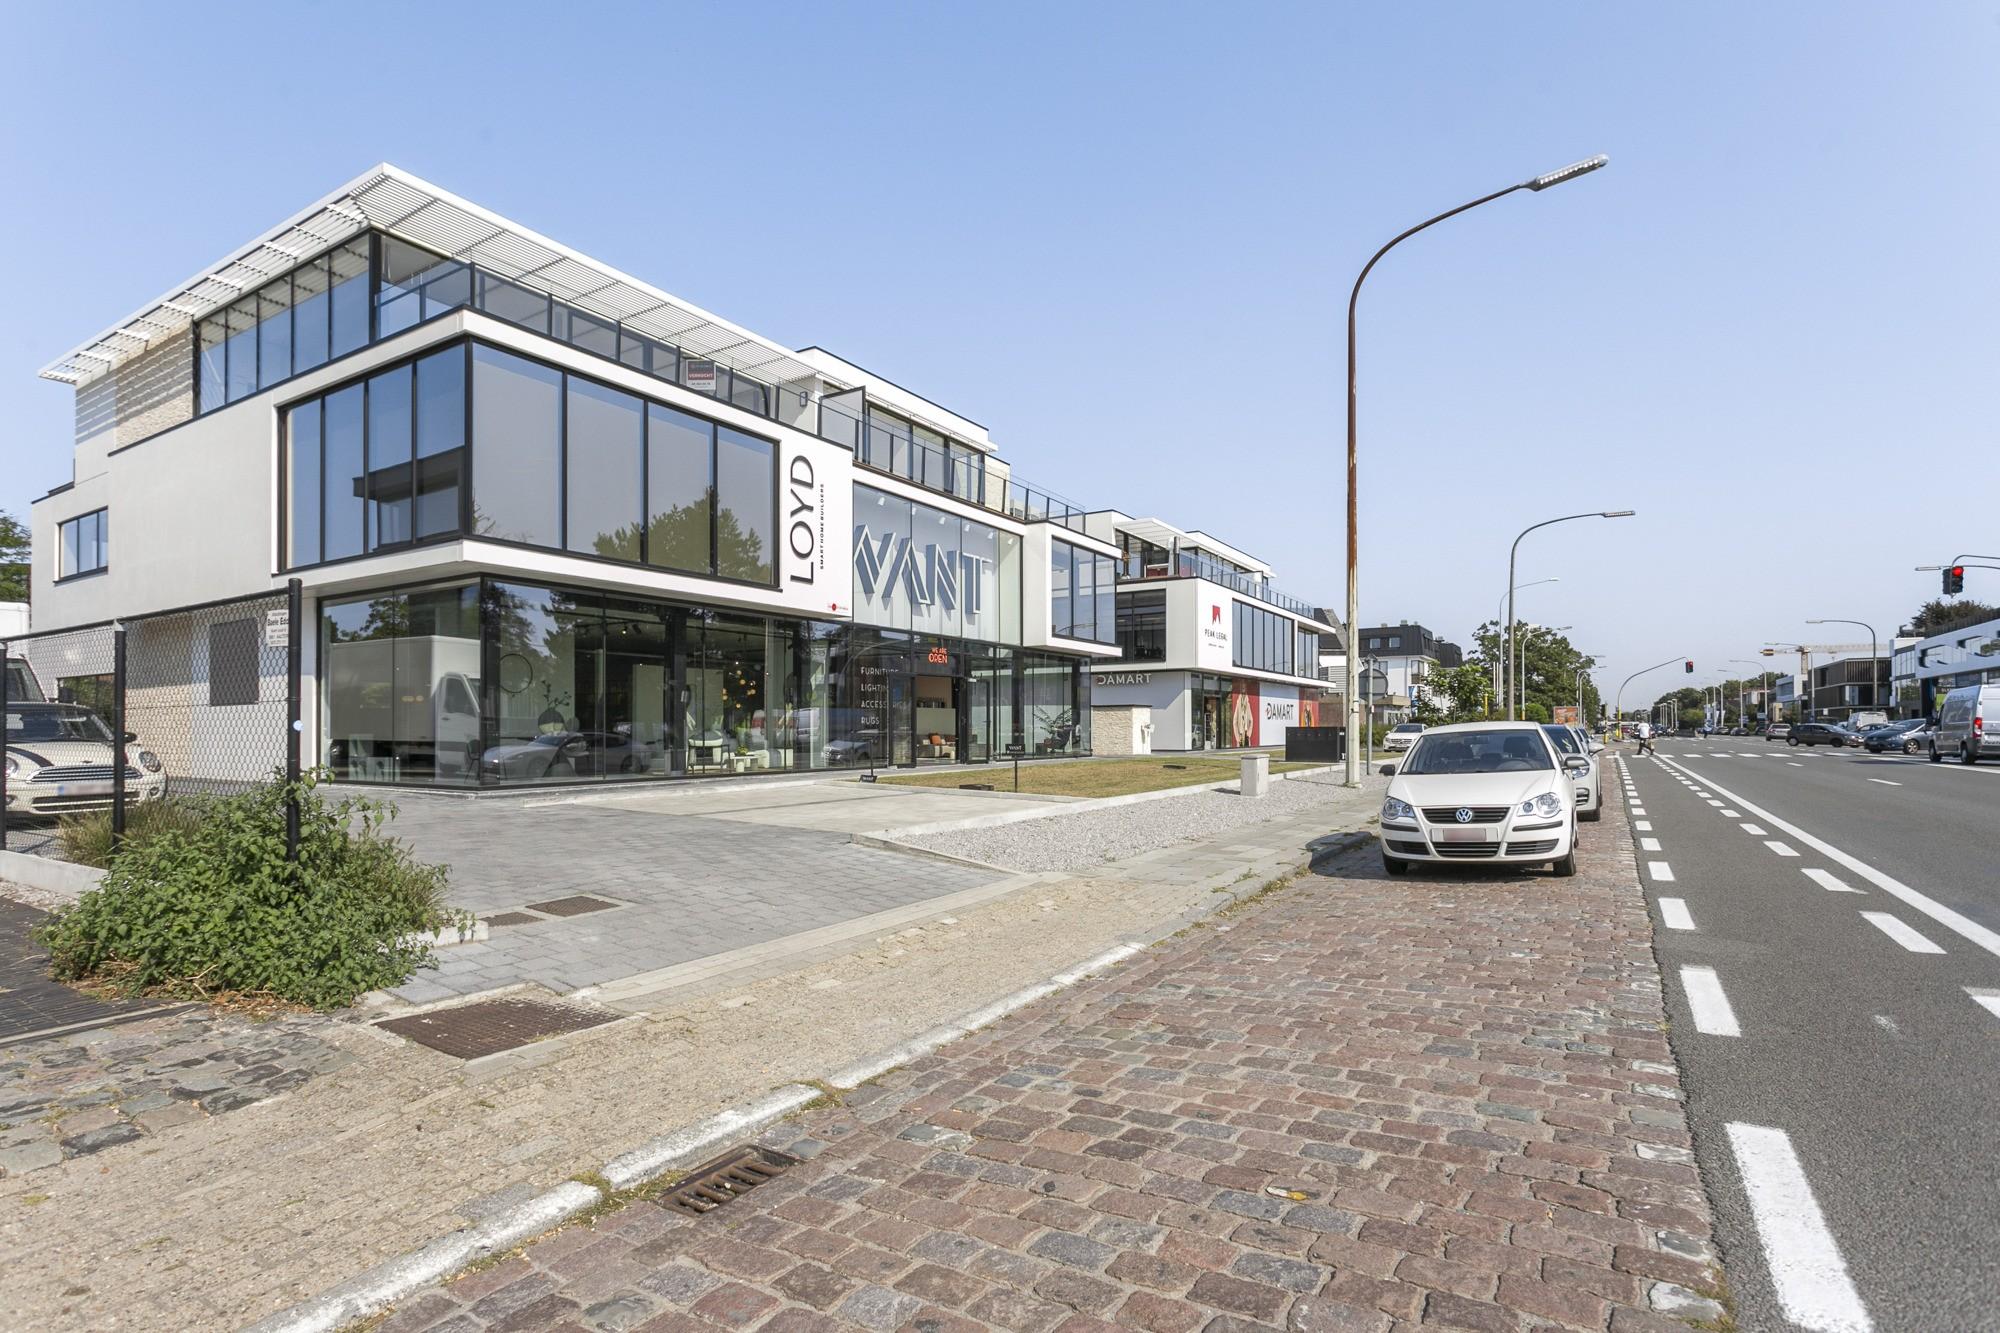 Sint-Denijs-Westrem